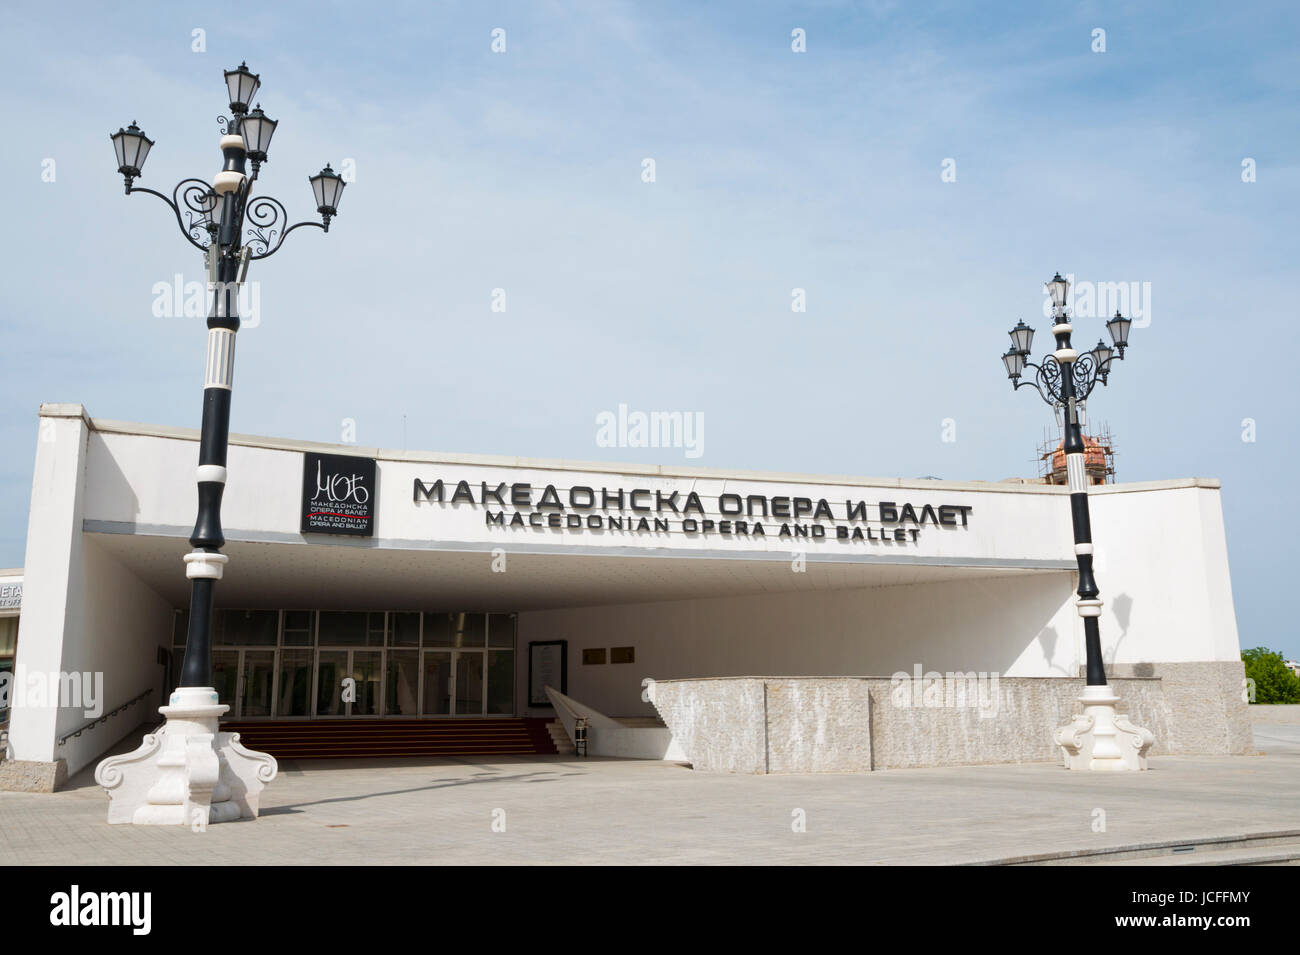 Macedonian opera and ballet building, Skopje, Macedonia - Stock Image